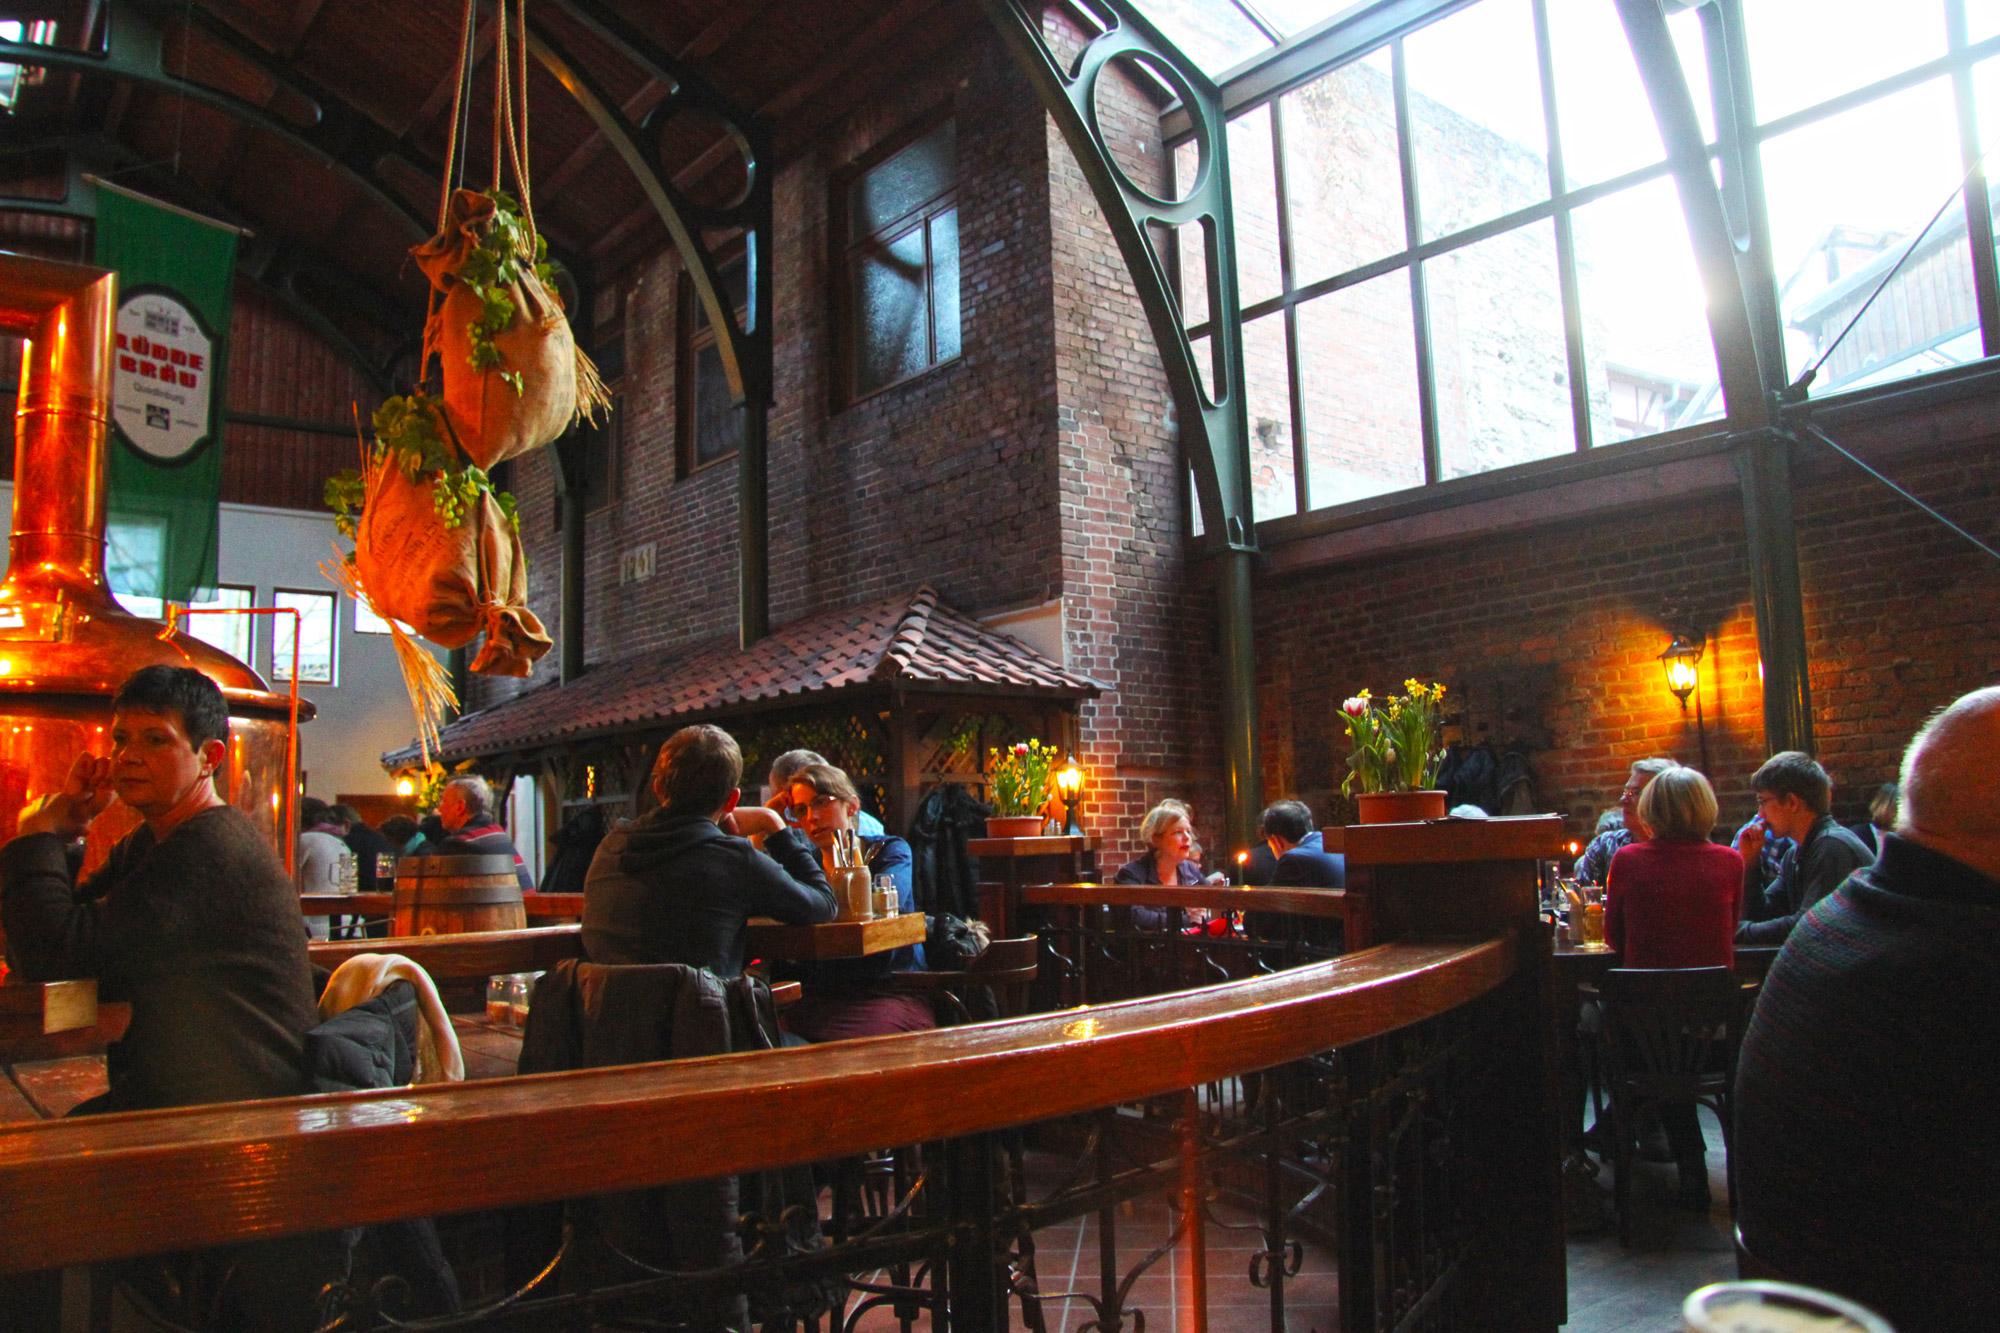 Top 5 must-do's in Quedlinburg - Avondeten in Brauerei Lüdde